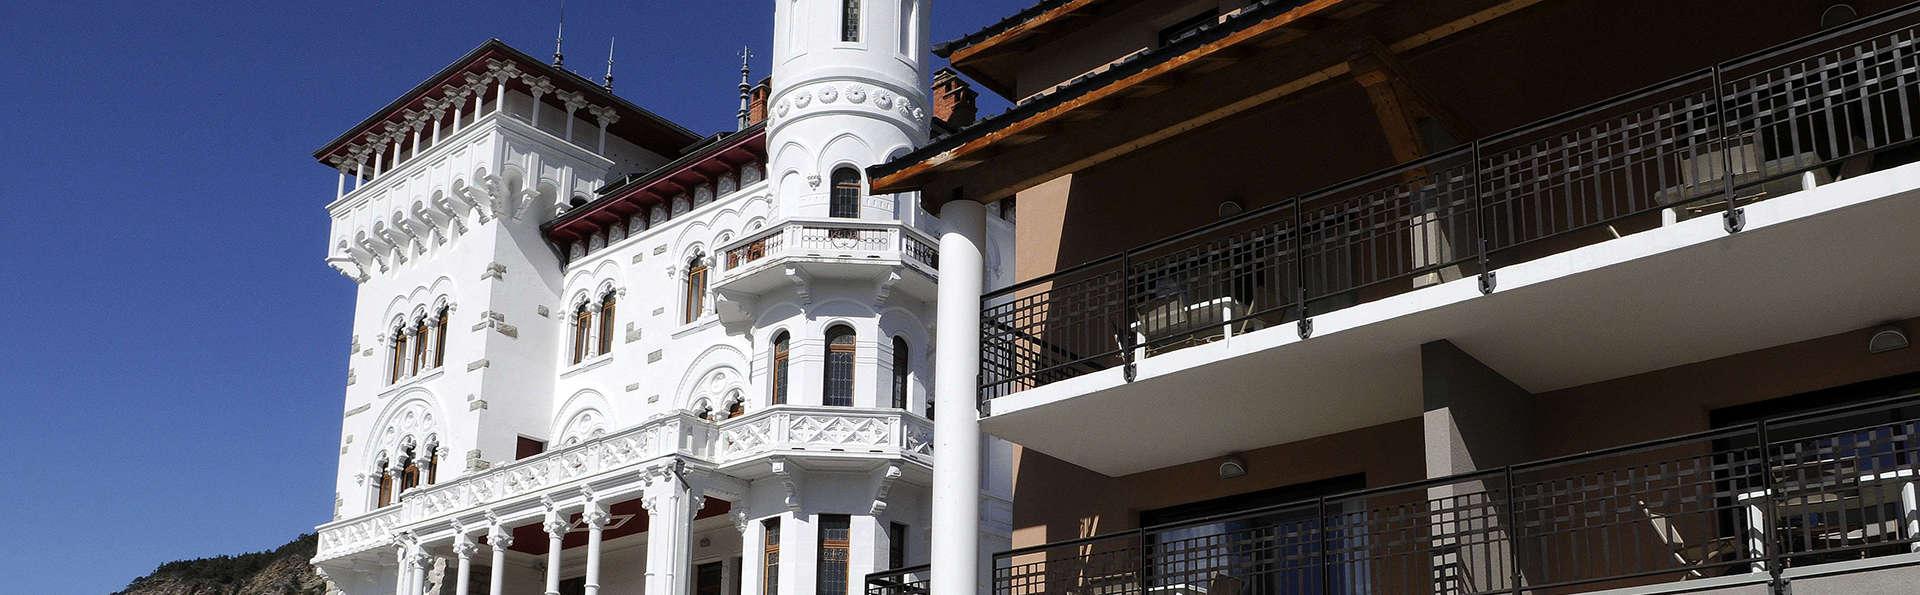 Château Des Magnans - edit_facade7.jpg